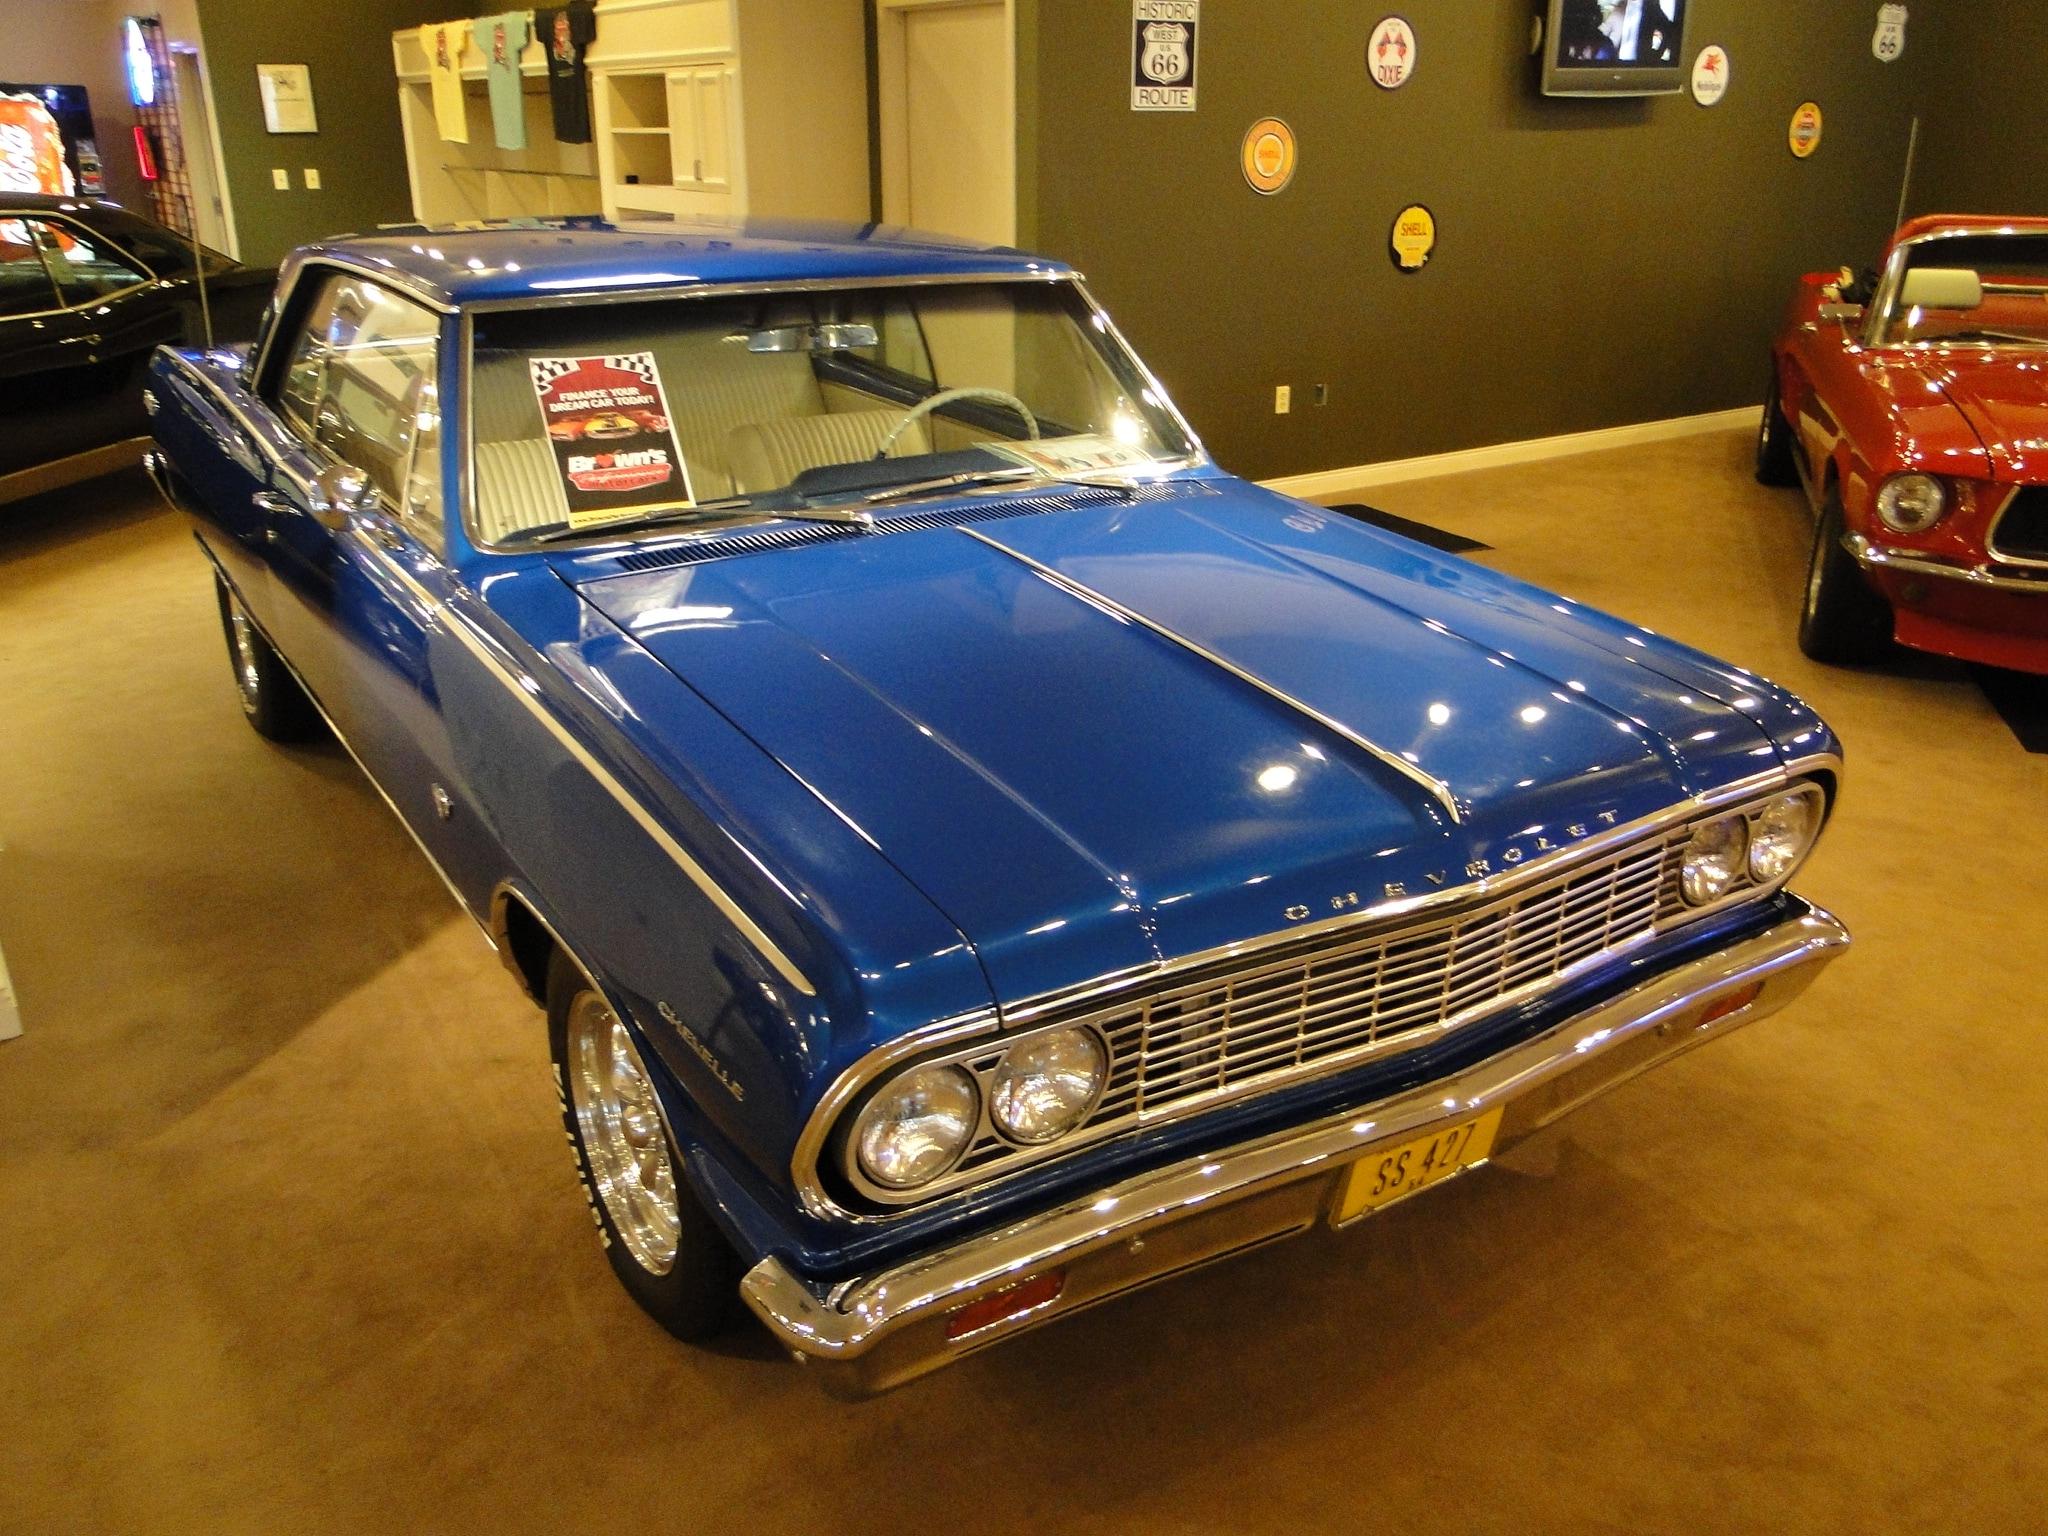 Autonation Dodge Dealership Savannah >> Pre Owned Vehicles North Point Chrysler Jeep | Upcomingcarshq.com